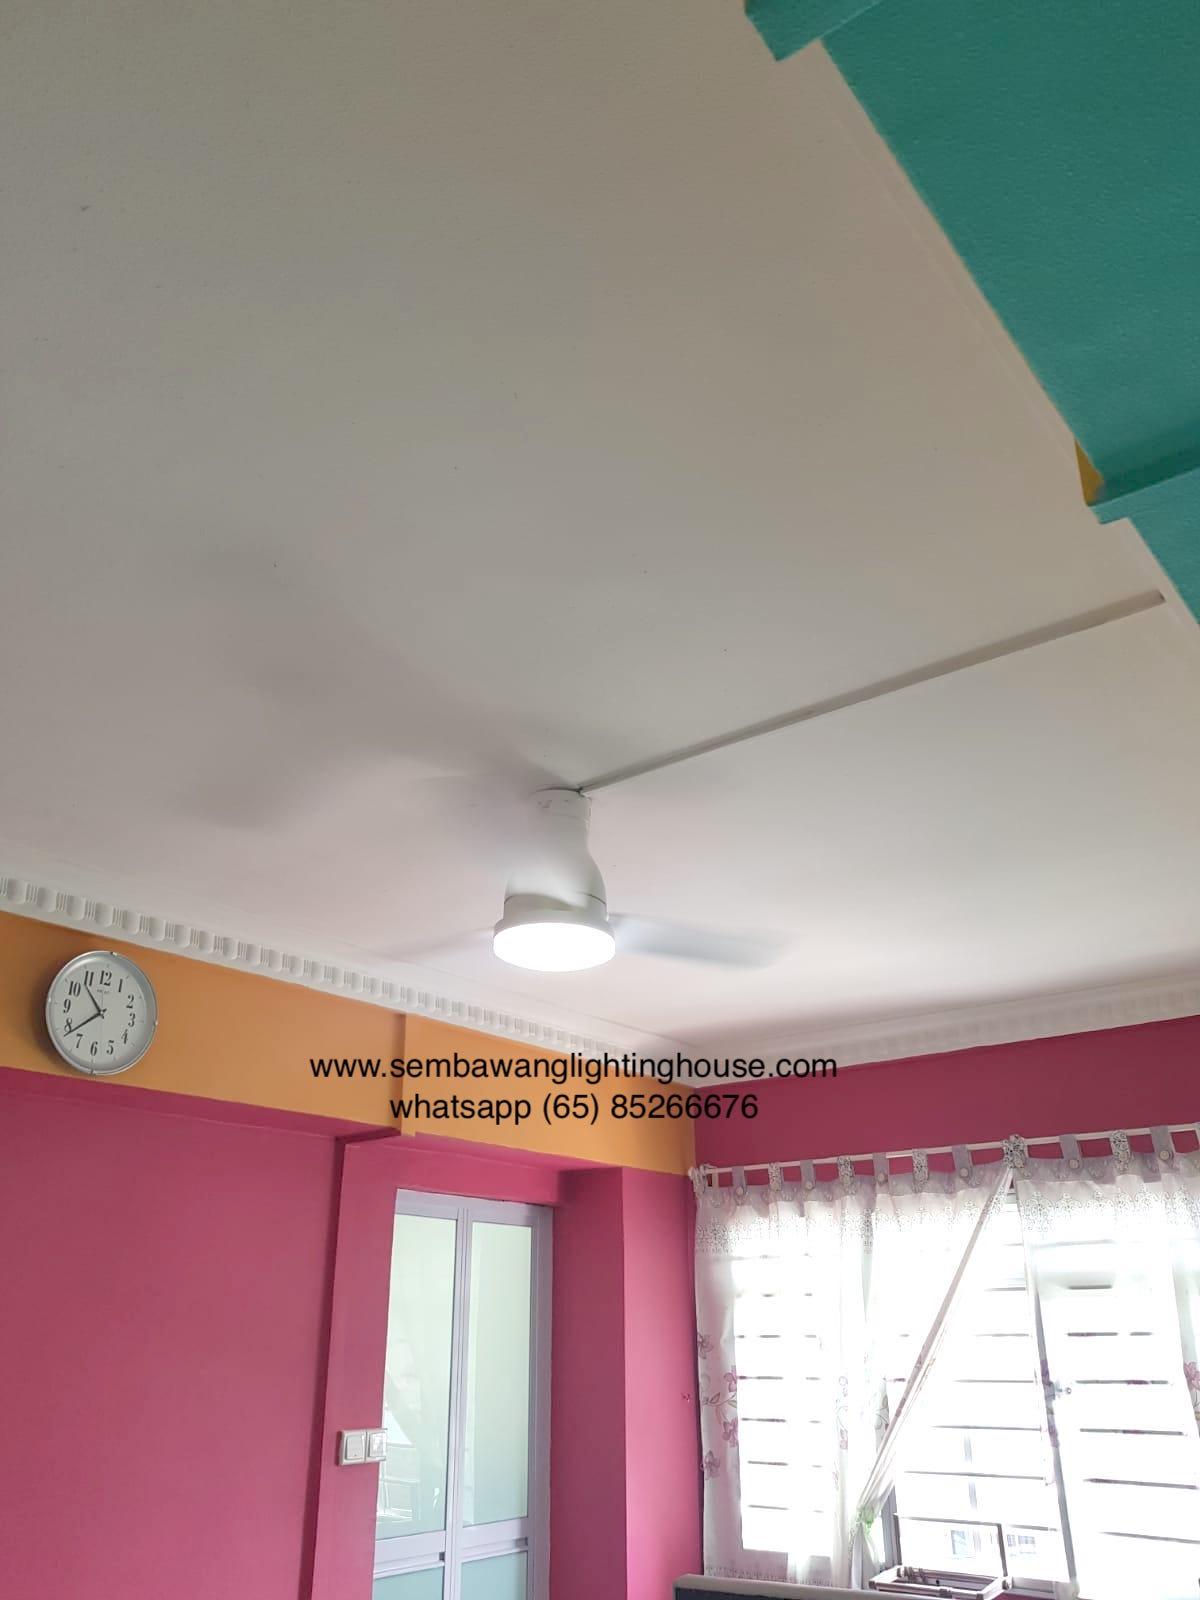 kdk-u48fp-white-ceiling-fan-sembawang-lighting-house-sample-07.jpg